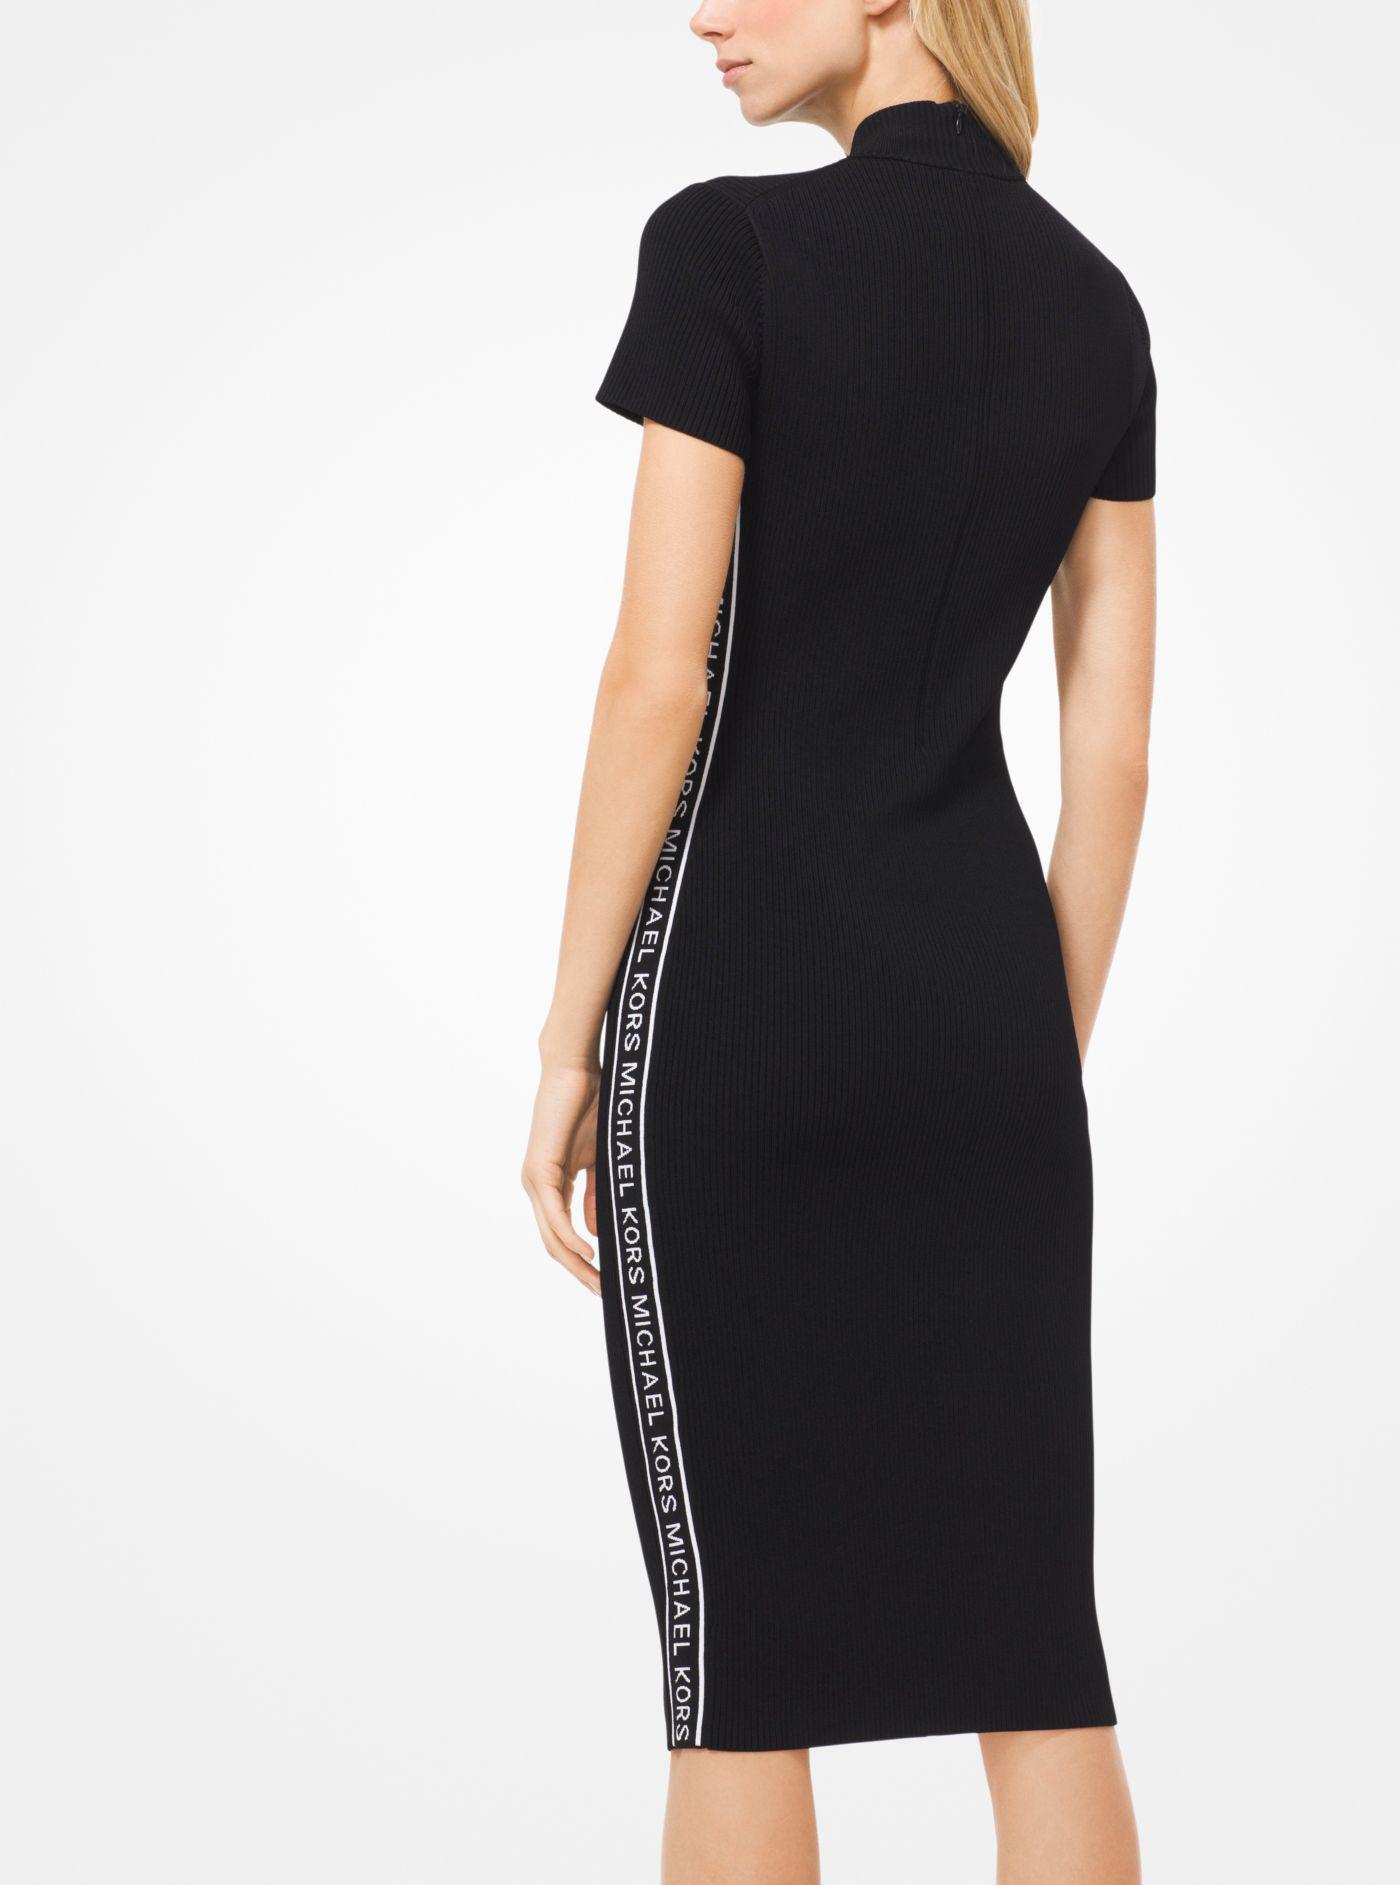 c4c75ca7bca Michael Kors Logo Tape Ribbed Knit Dress in Black - Lyst